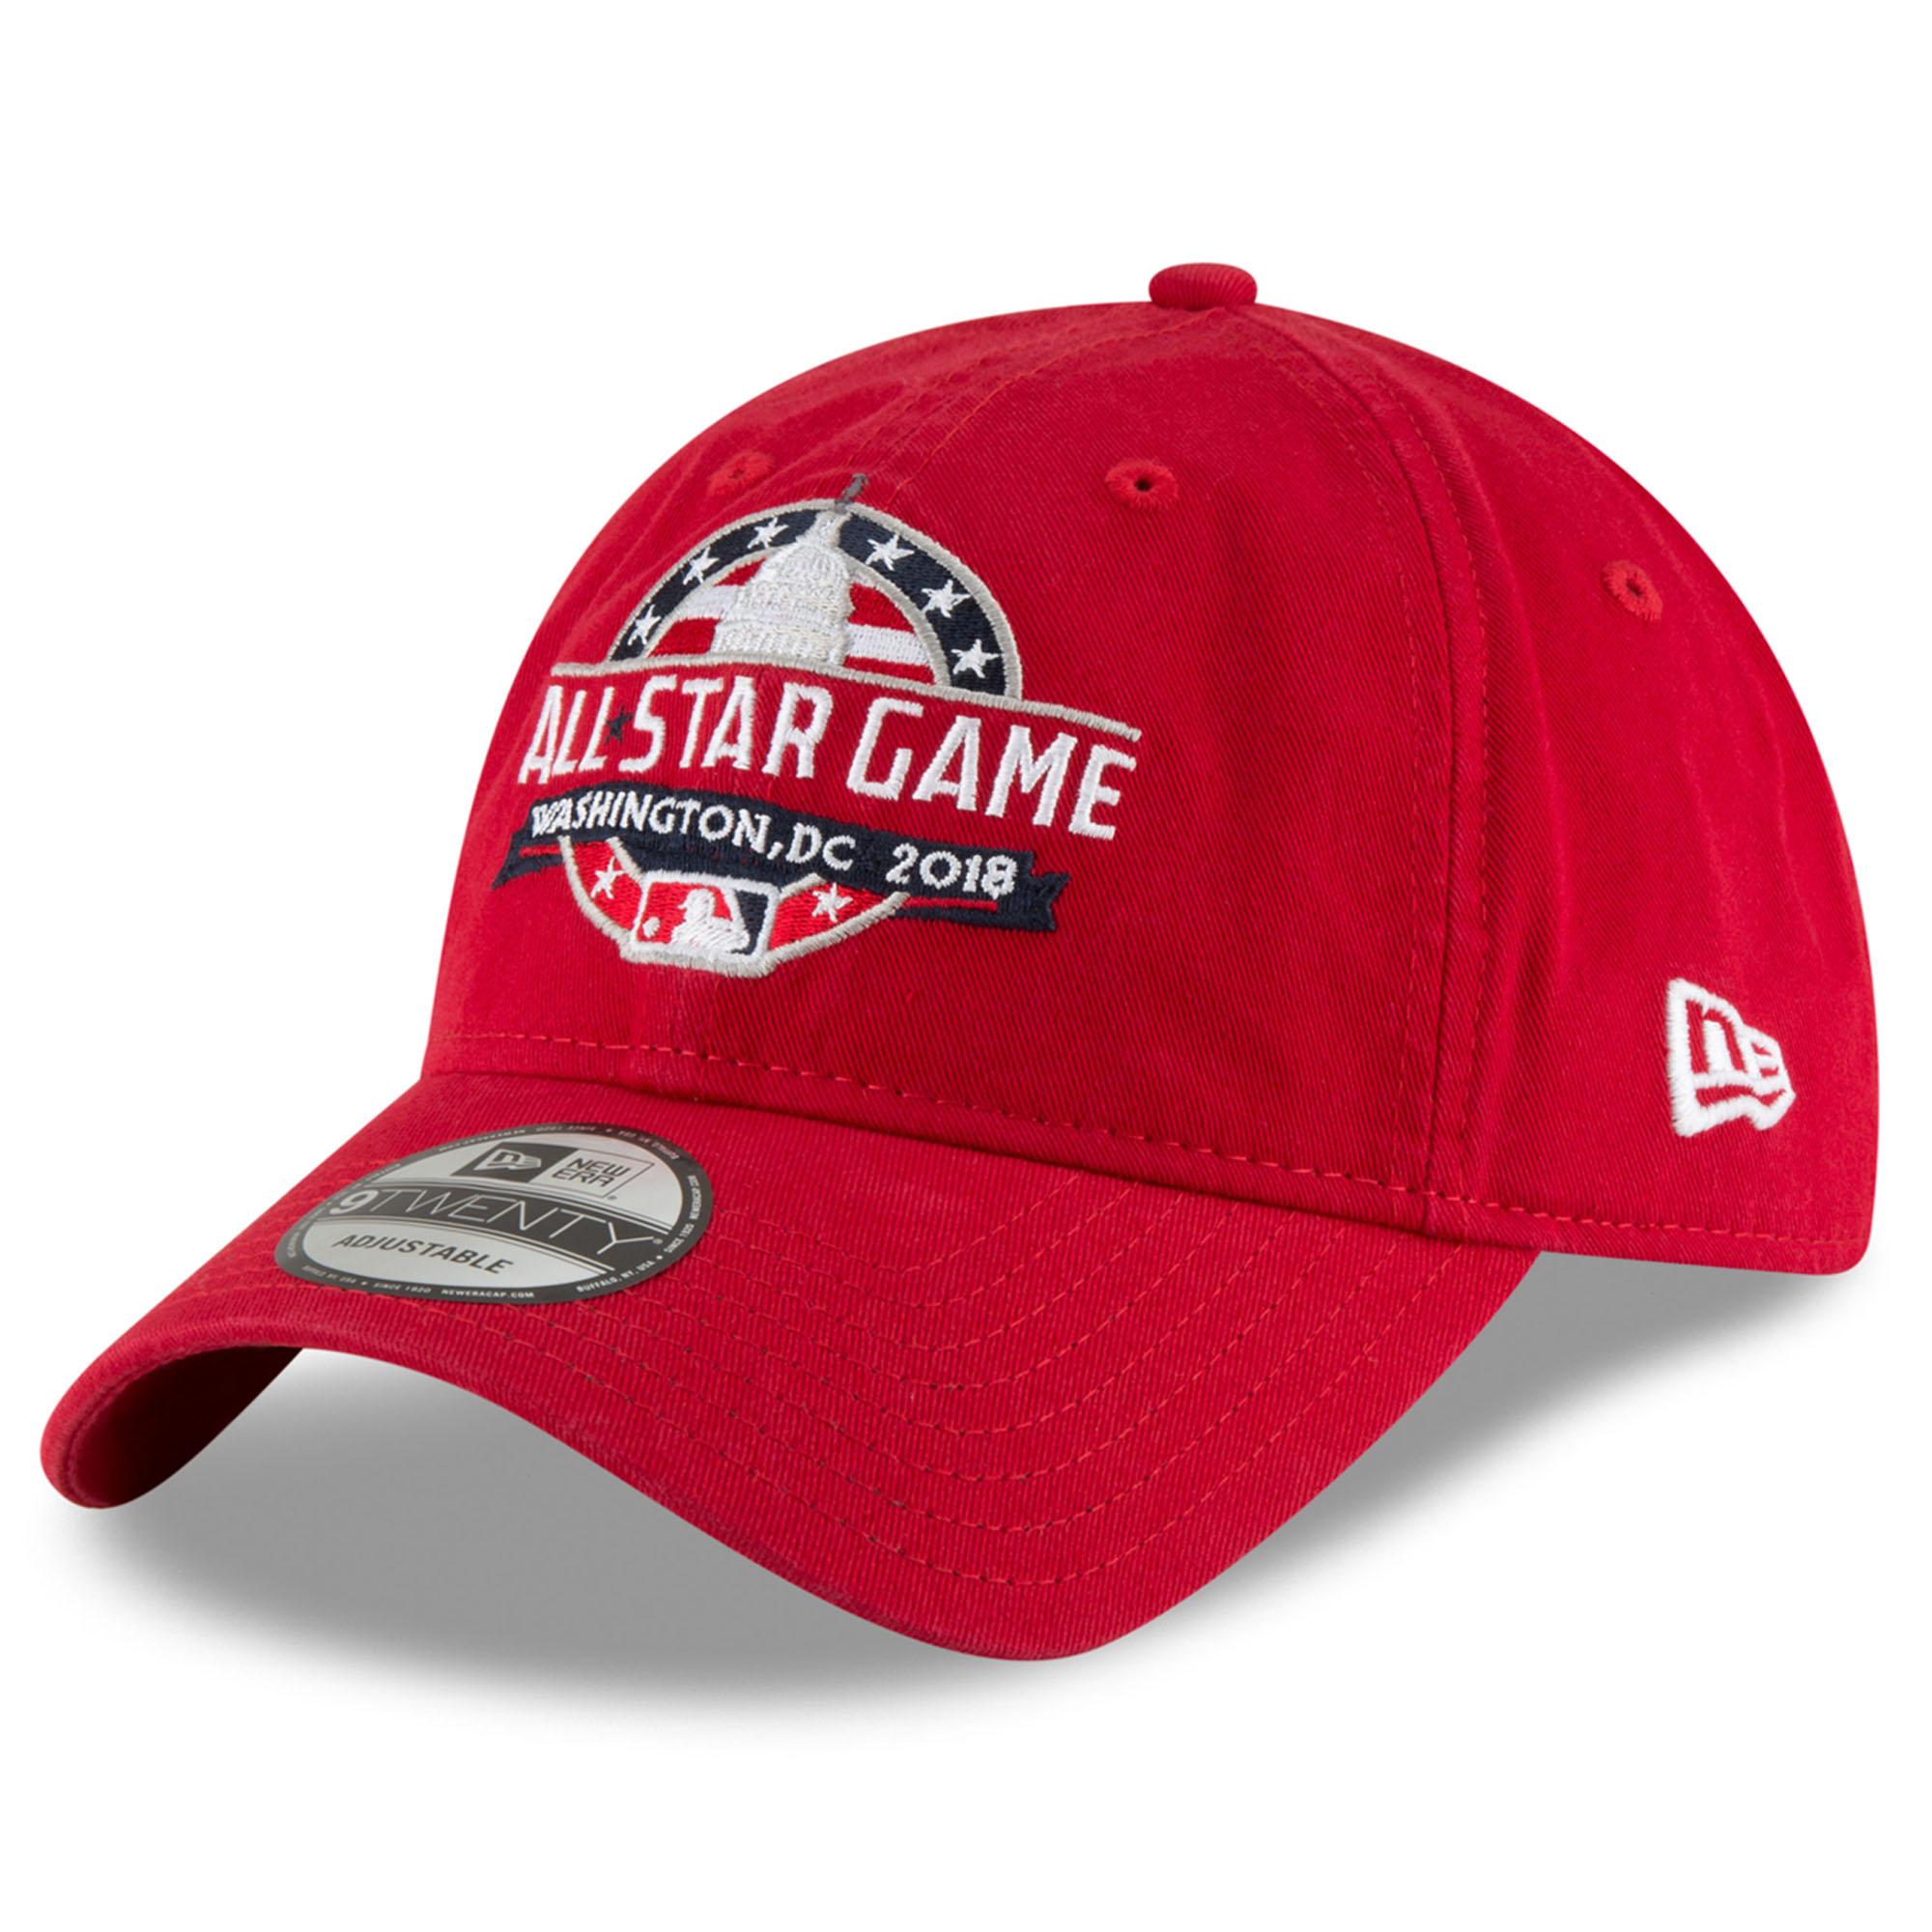 New Era 2018 MLB All-Star Game Core Classic 9TWENTY Adjustable Hat- Red - OSFA